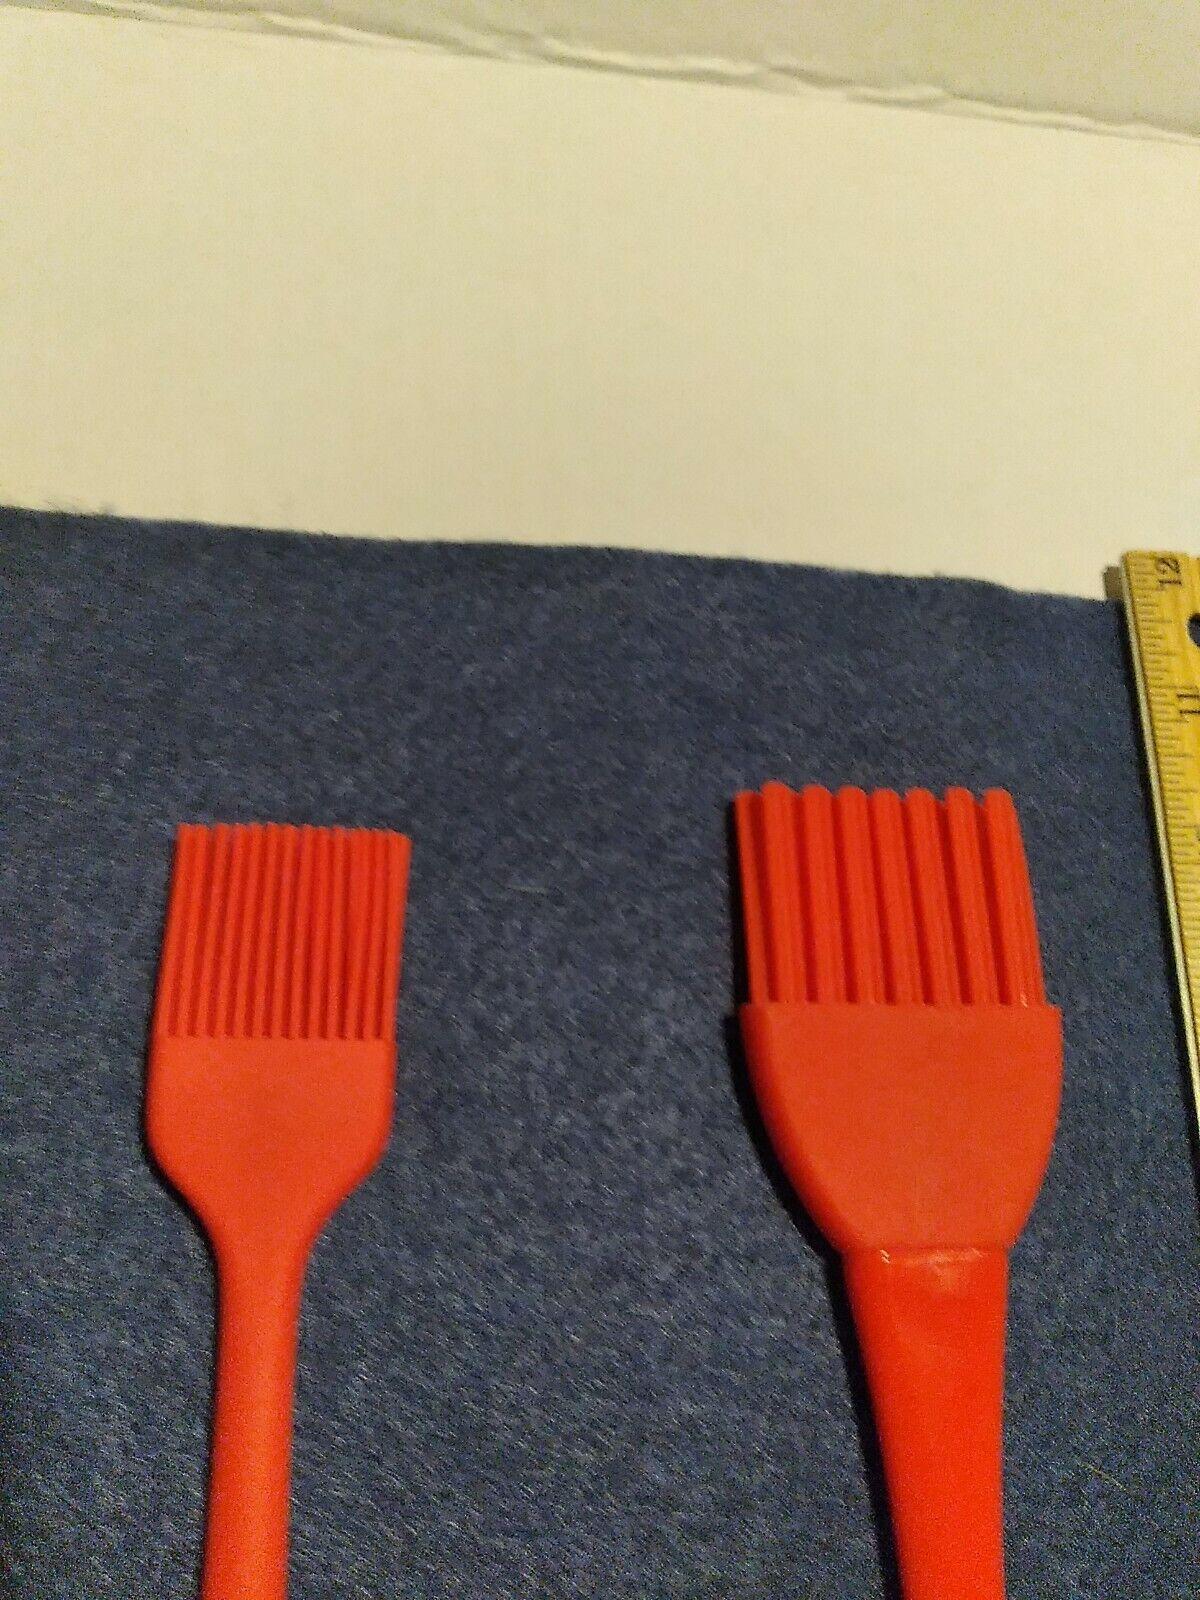 Cannabis Brush Set Cannabis Trimming Tool/brush (Cannabrush)